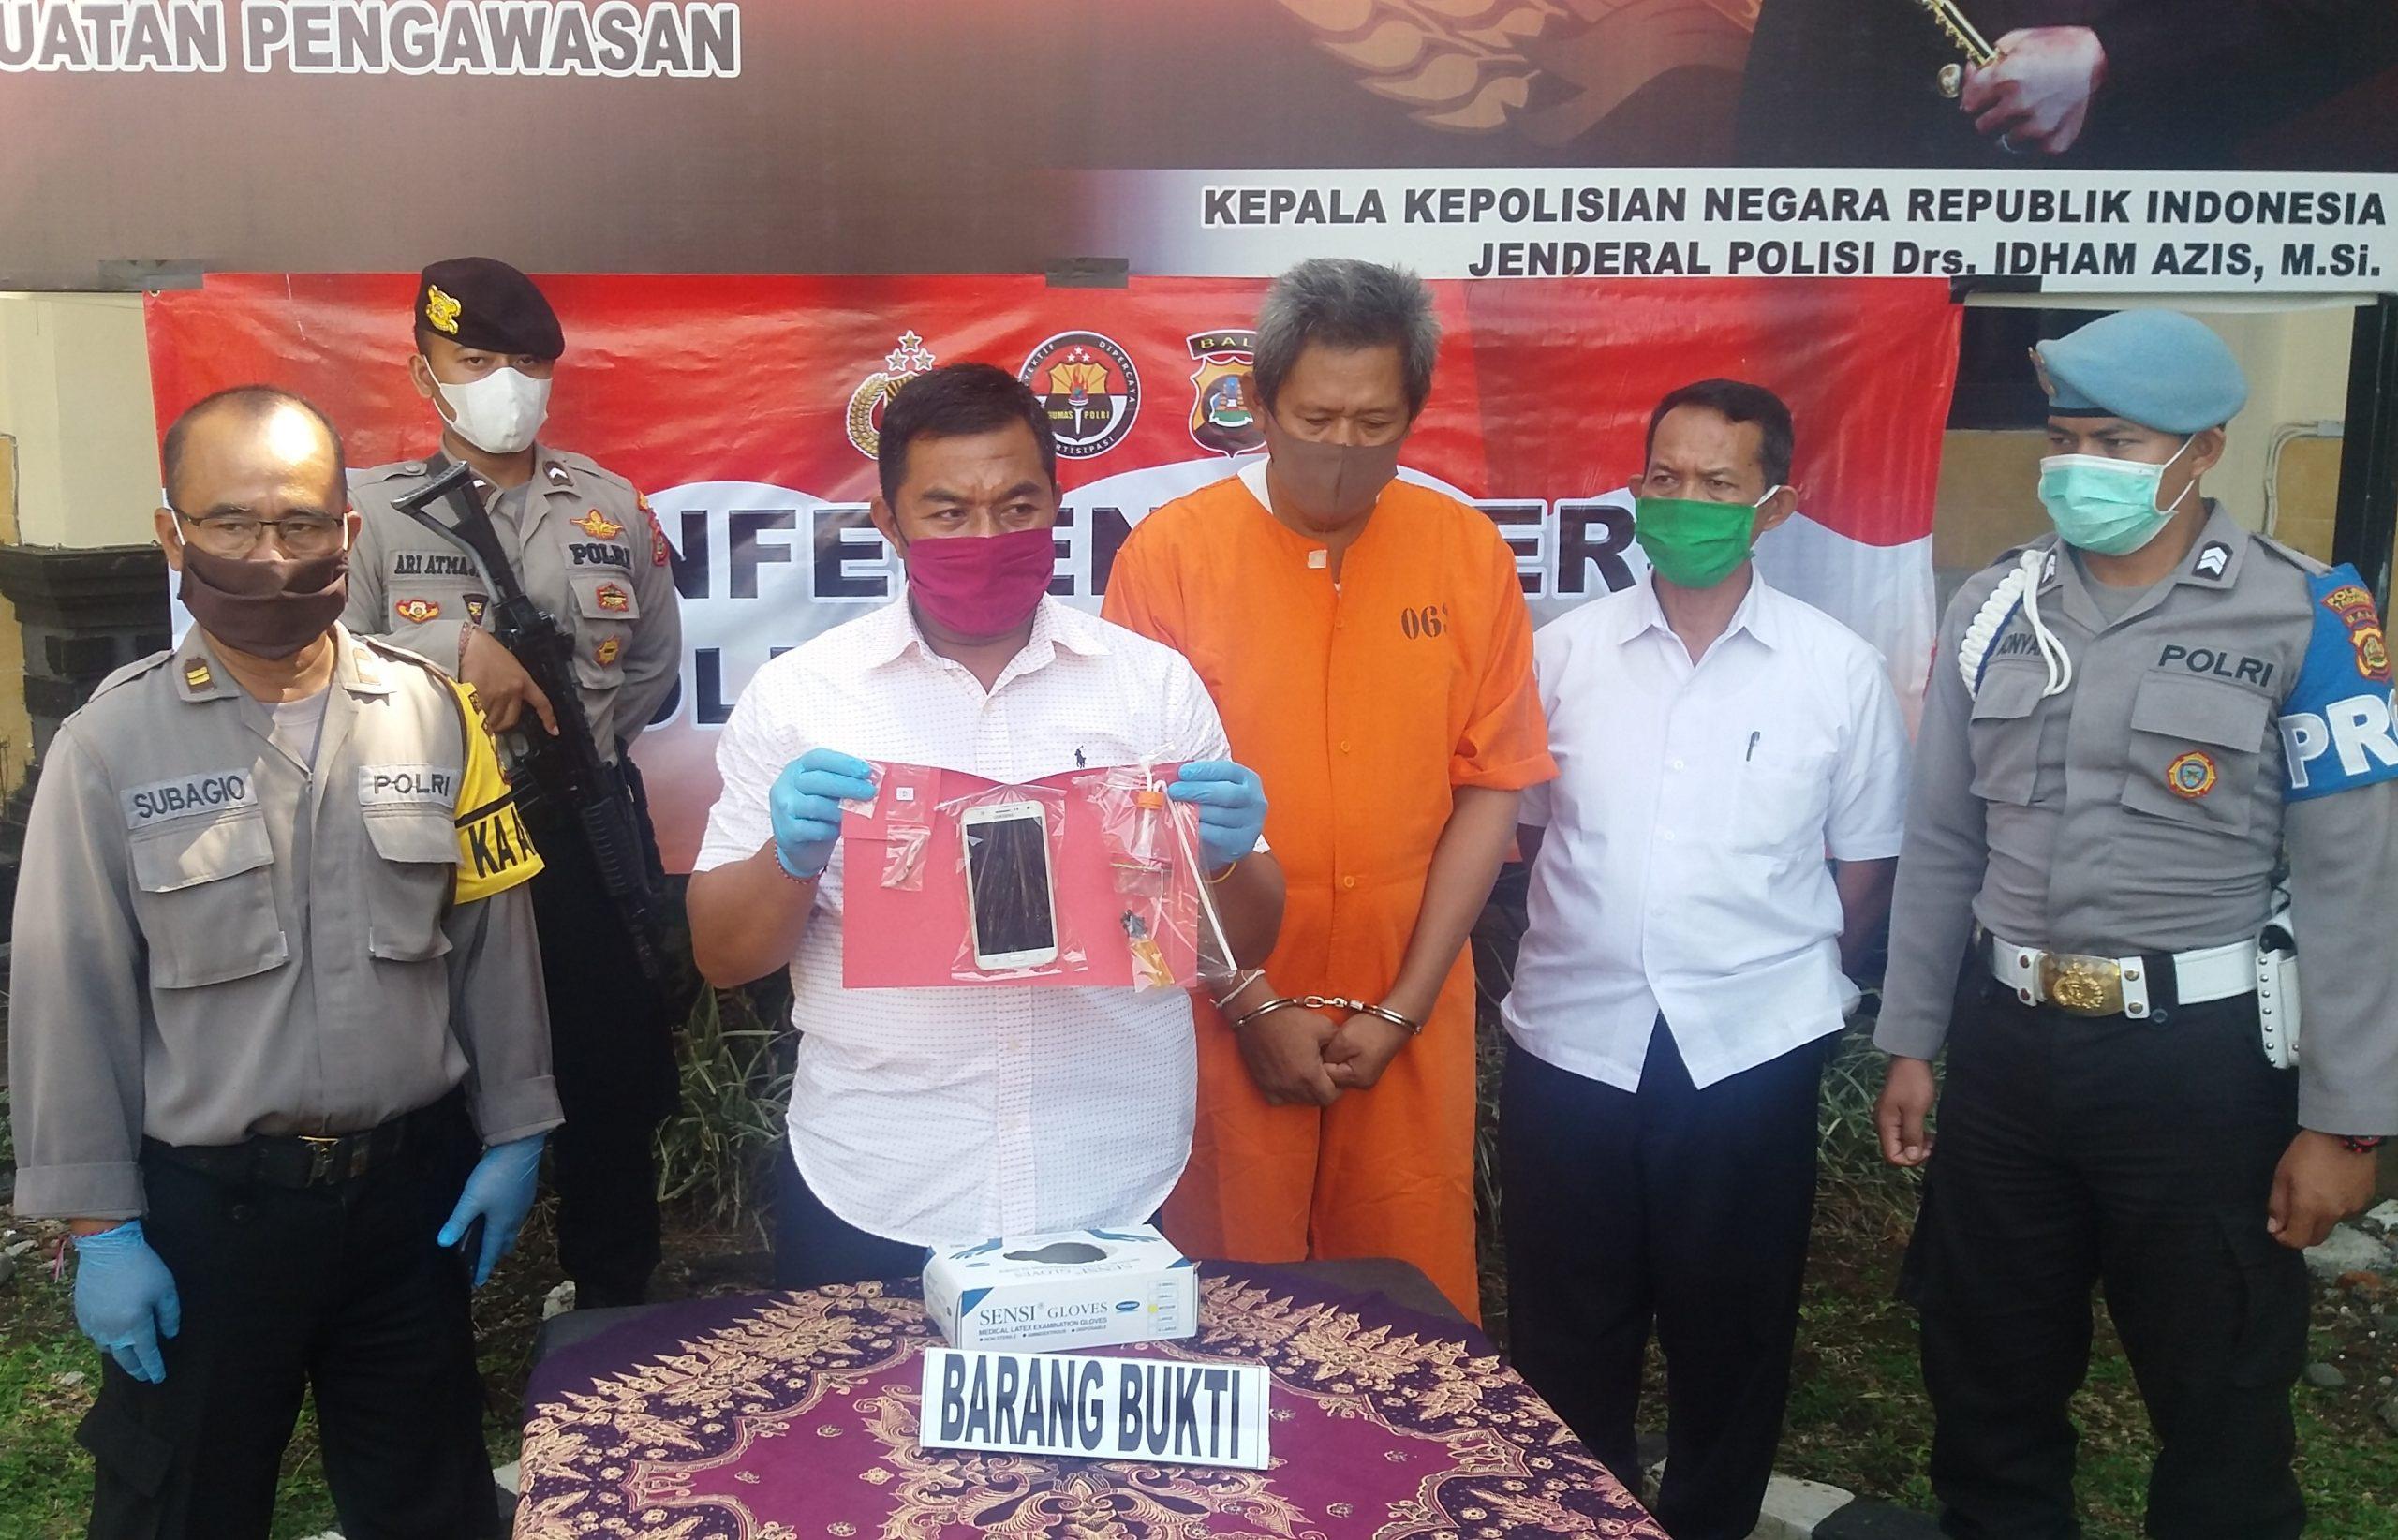 POLRES Tabanan menggeber kasus narkoba dengan tersangka Gede Bhasma Bhaskara alias Dek Bas, berikut sejulah barang bukti terkait, Senin (11/5/2020). Foto: gagah